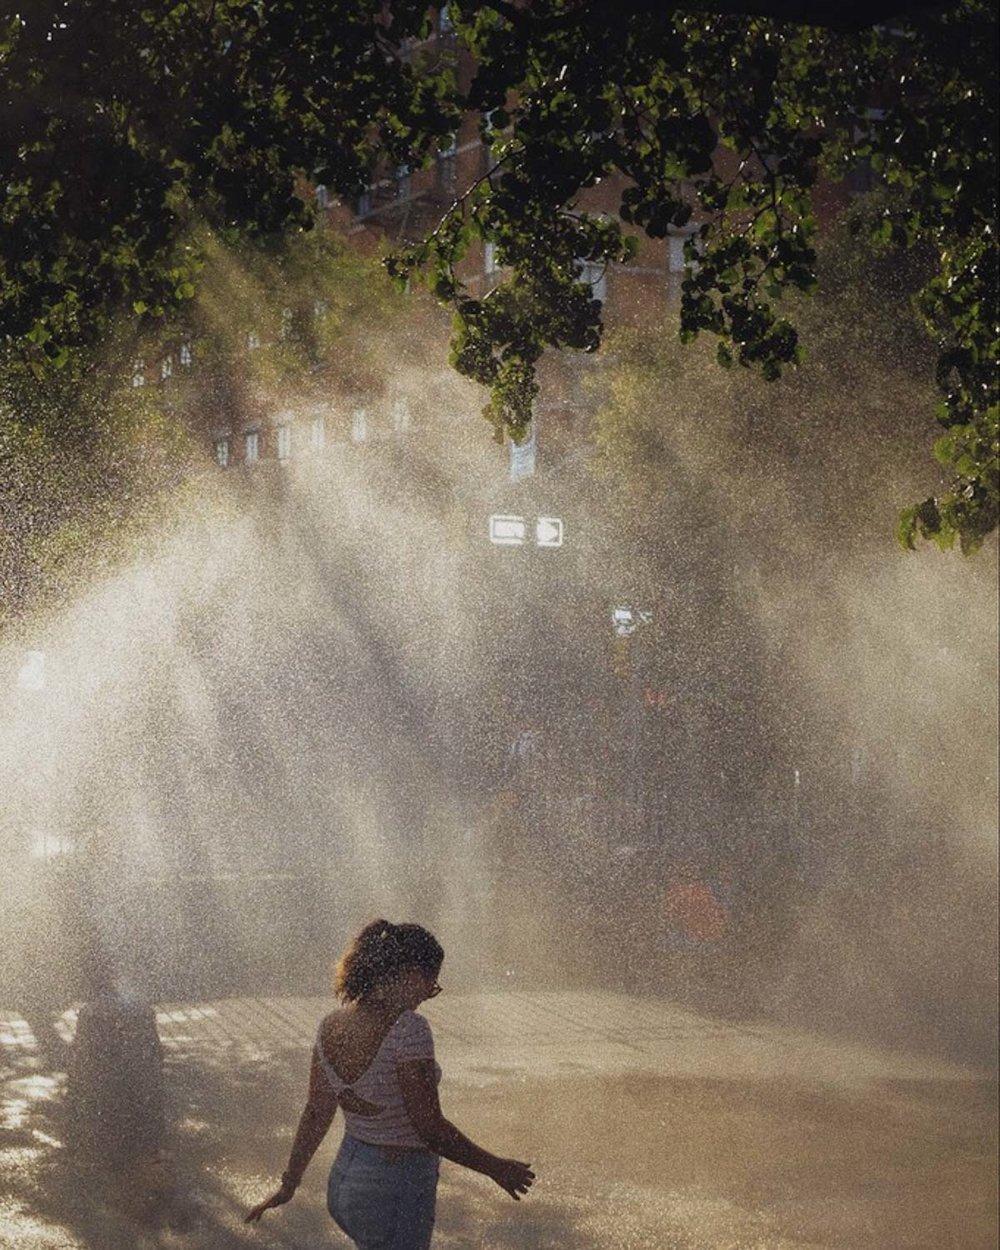 fuji-x100f-photo-walk-summer-nyc-street-shower.jpg